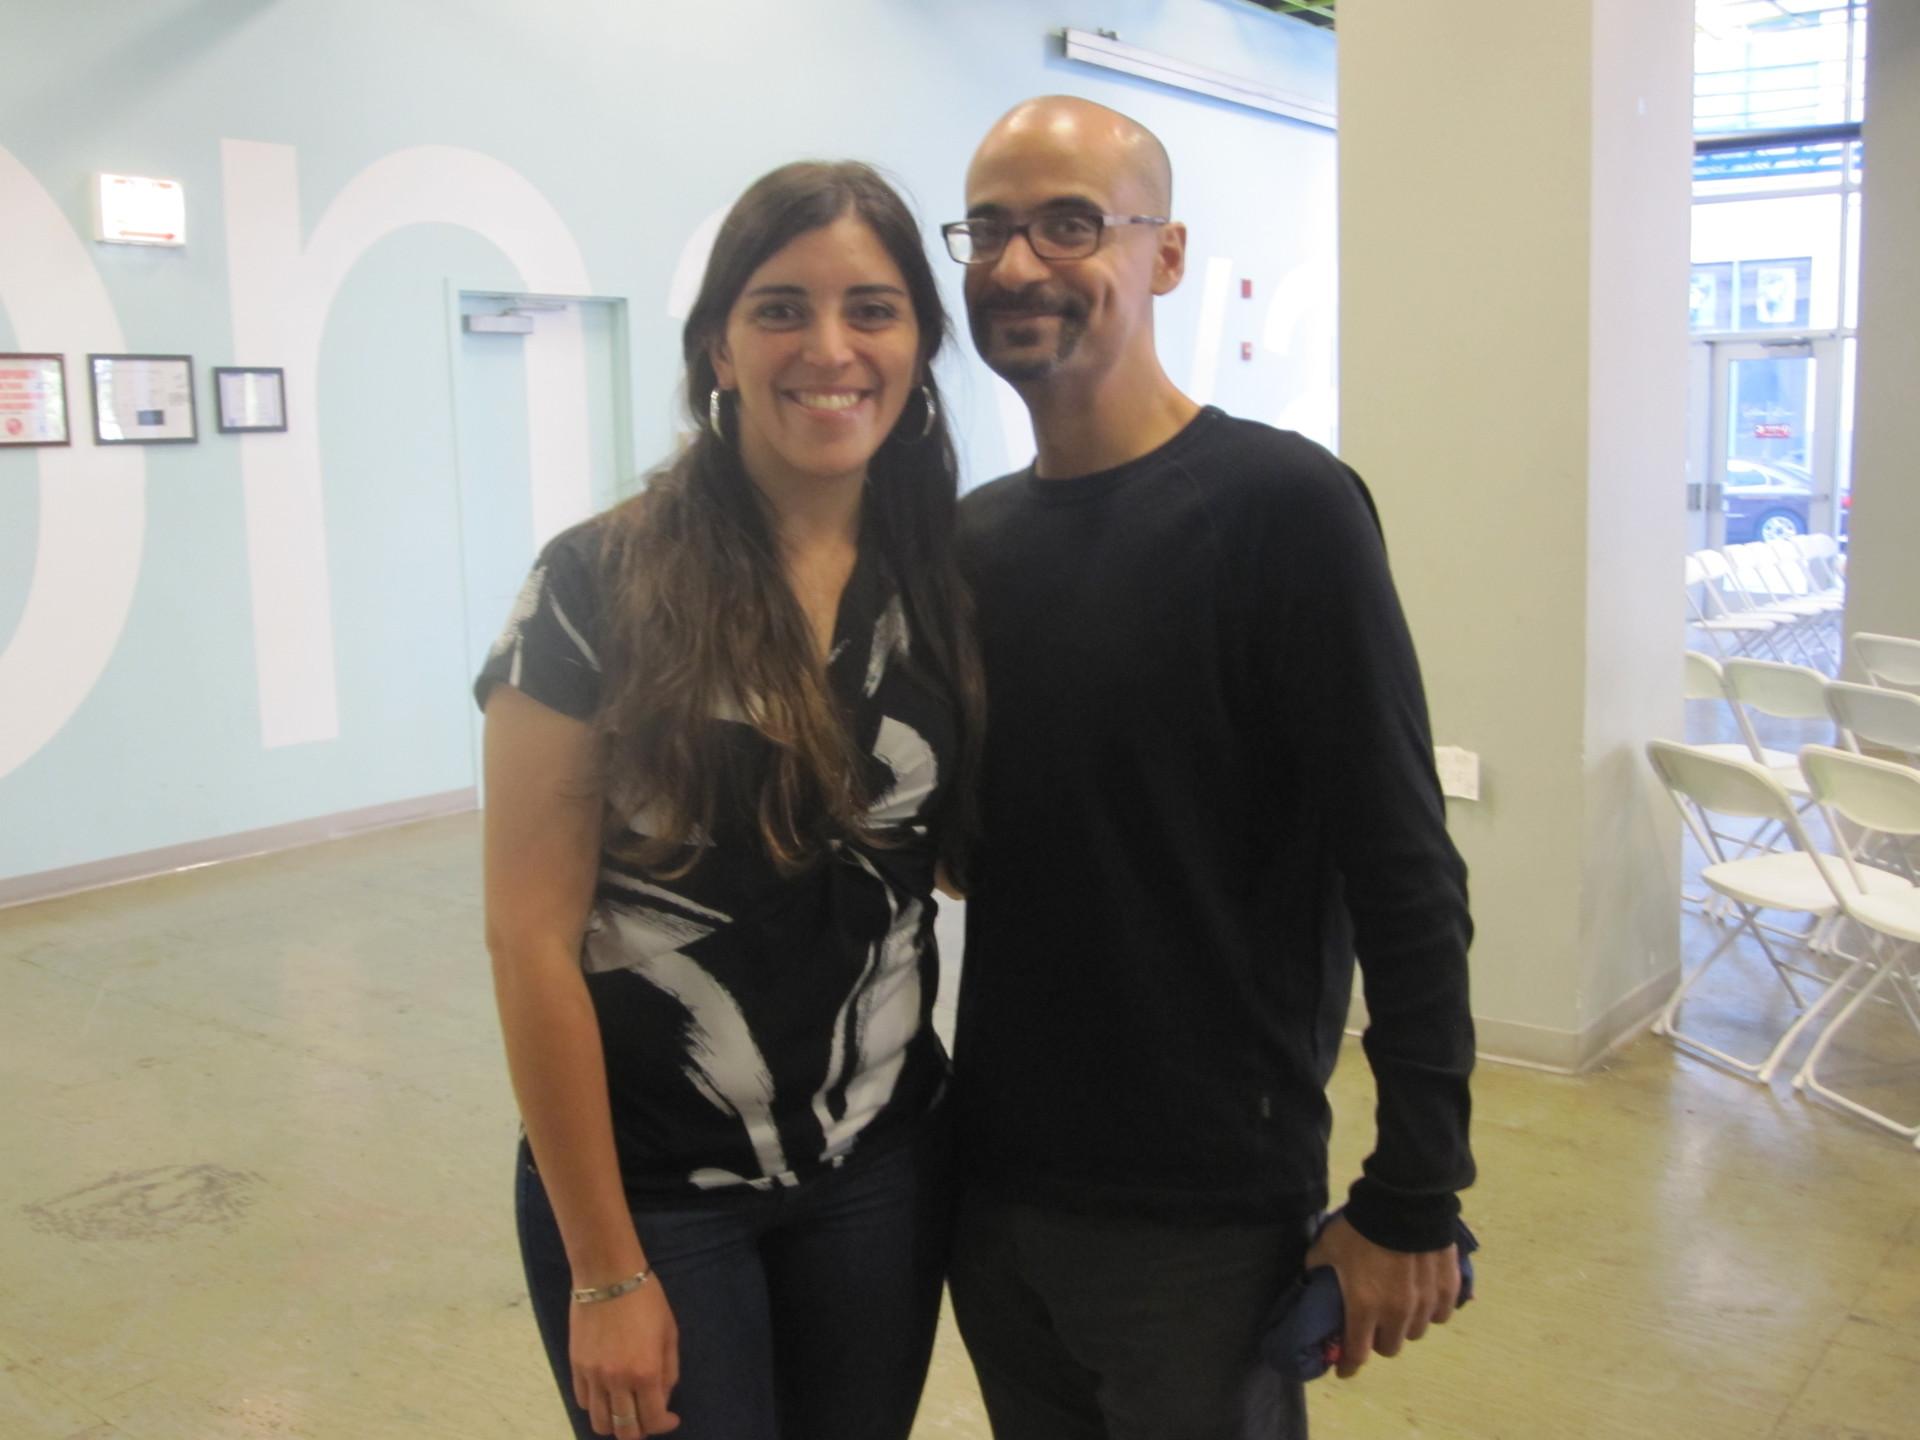 Meeting Junot Díaz. Chicago 2012